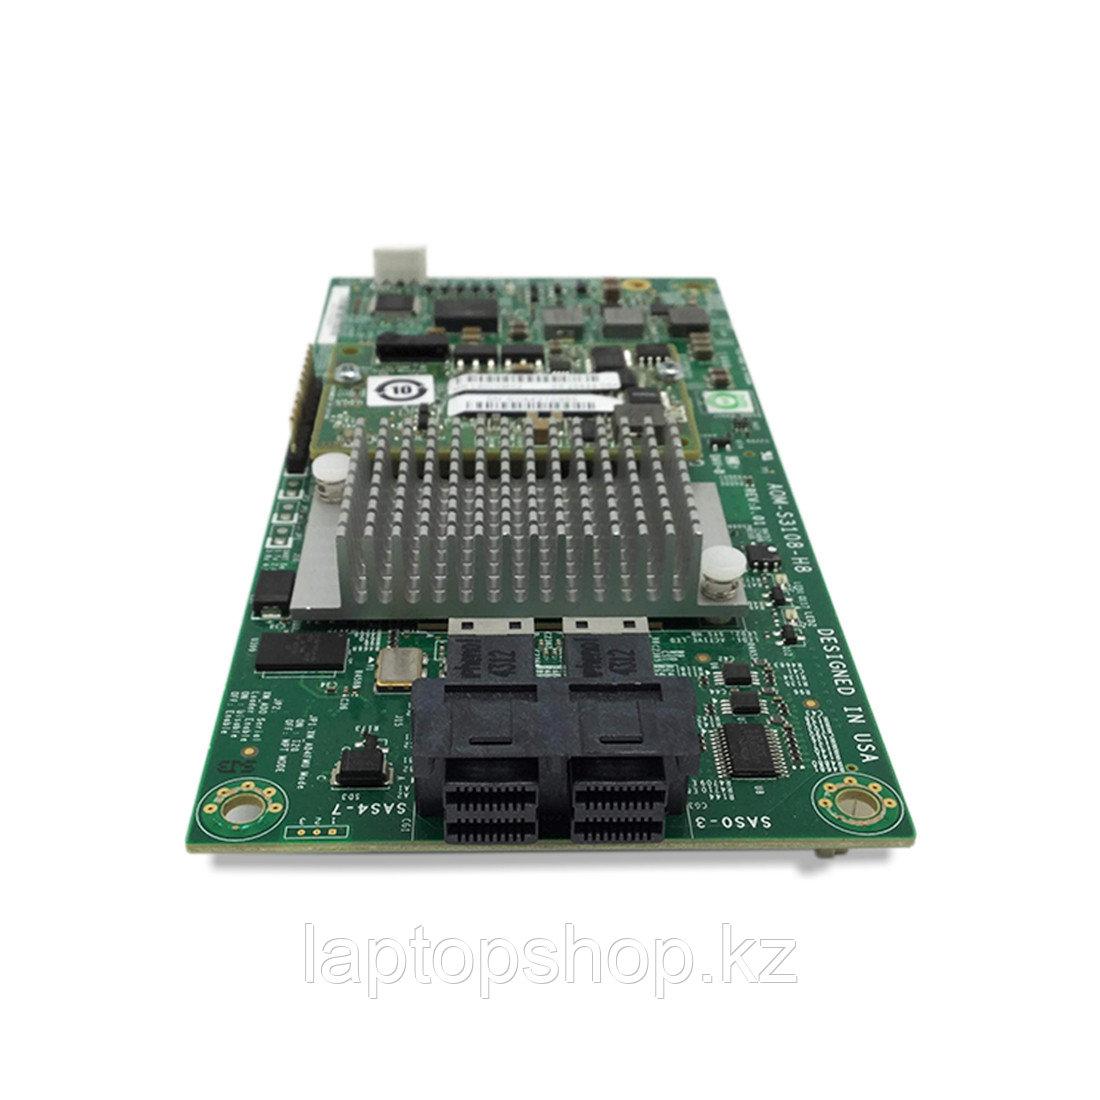 RAID контроллер Supermicro AOM-S3108M-H8